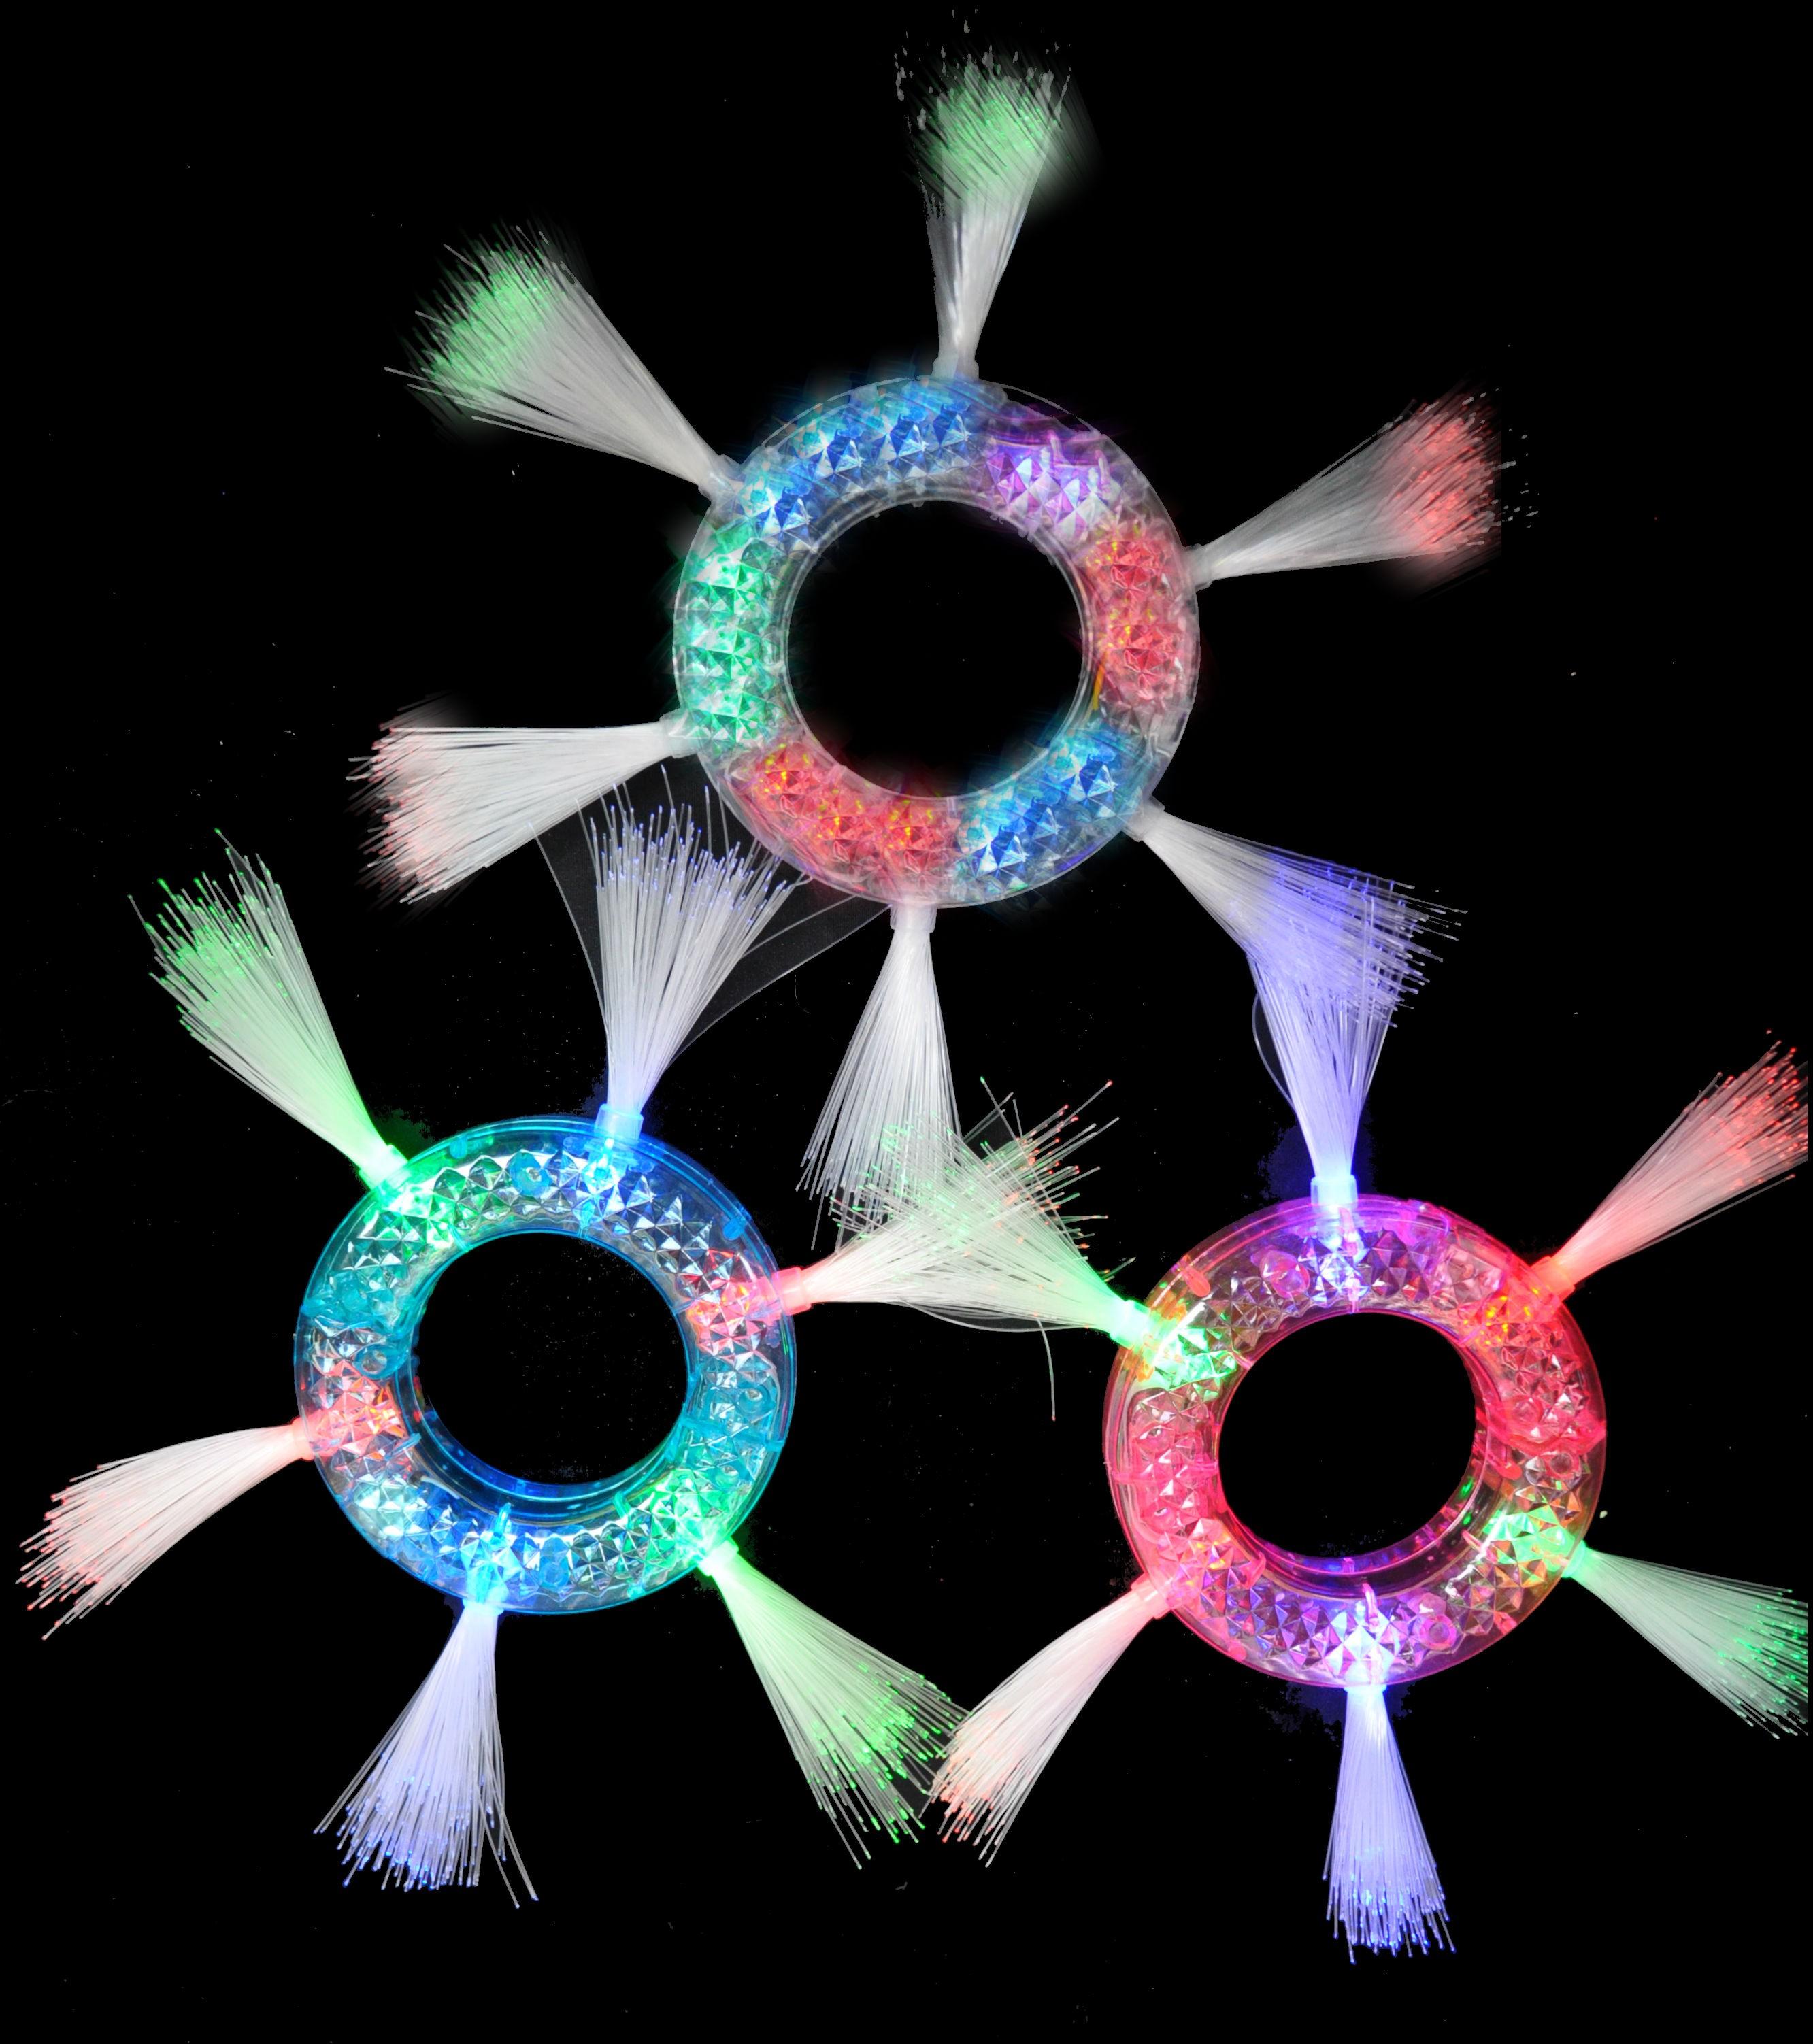 Jumbo Flashing Fiber Optic Bracelet 1 Piece Bracelets Shop Glow Led Lights